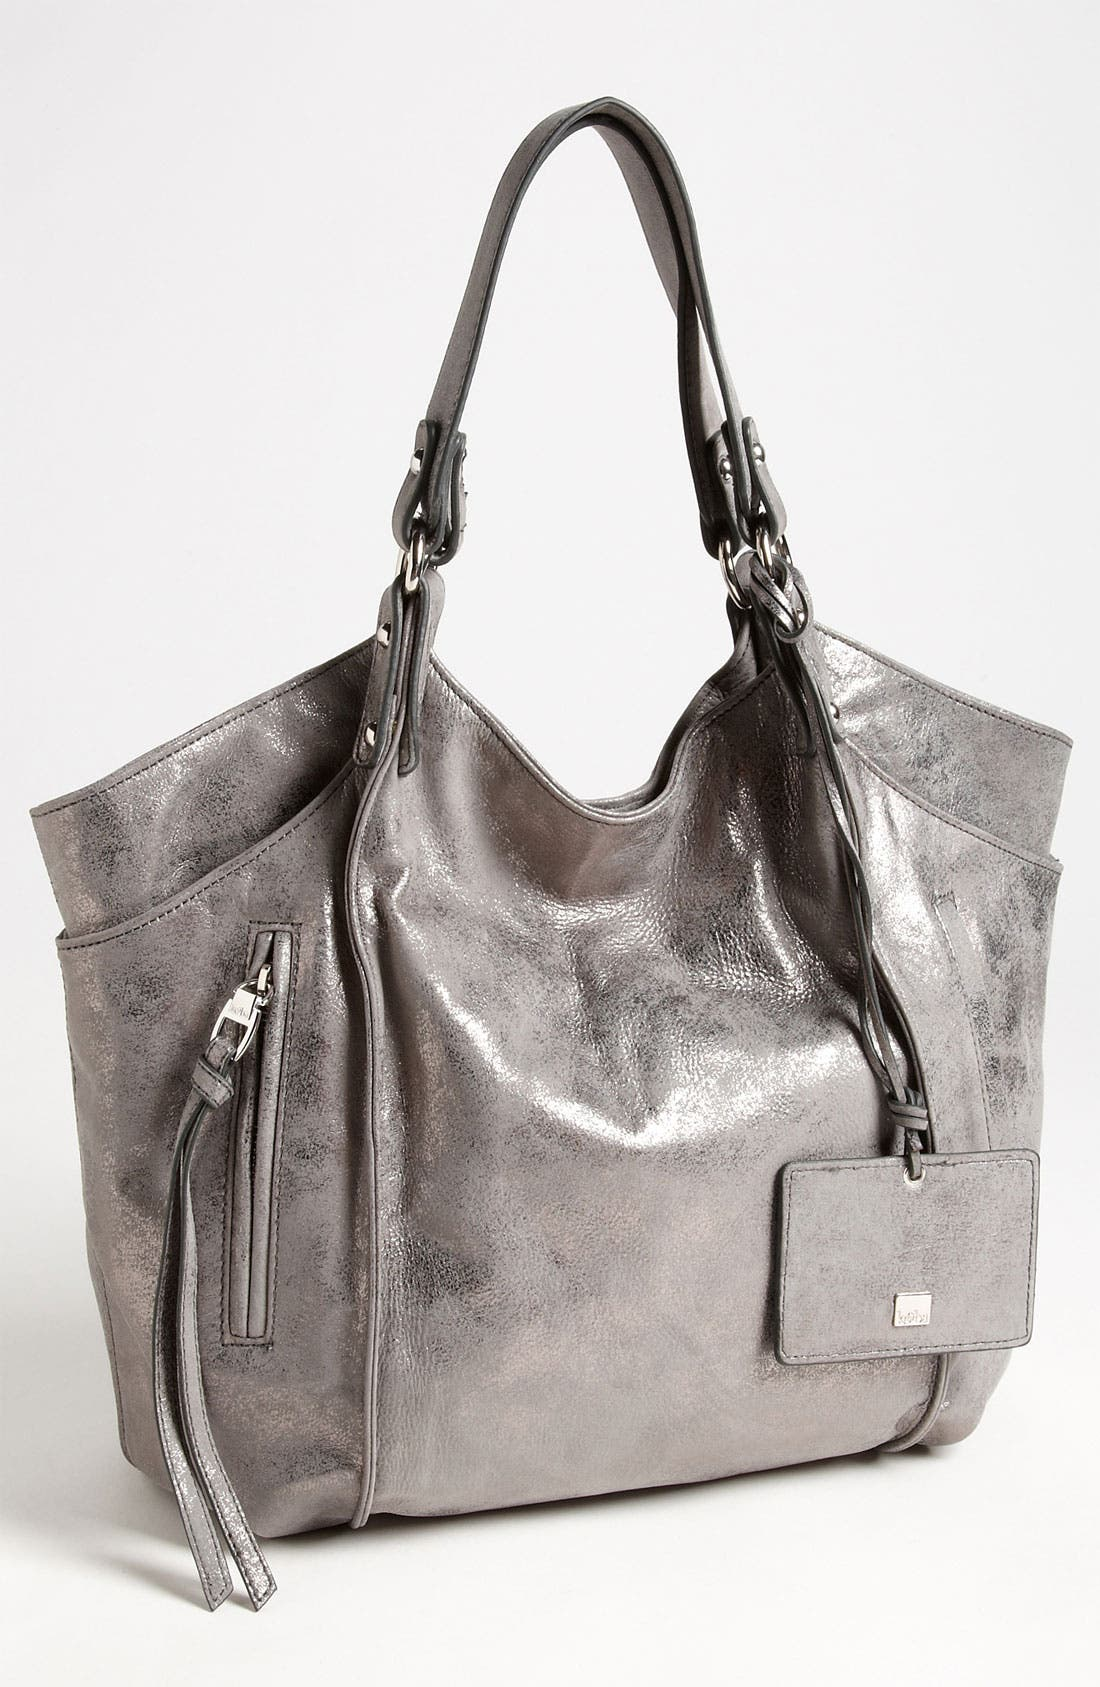 Alternate Image 1 Selected - Kooba 'Logan' Glitter Leather Tote